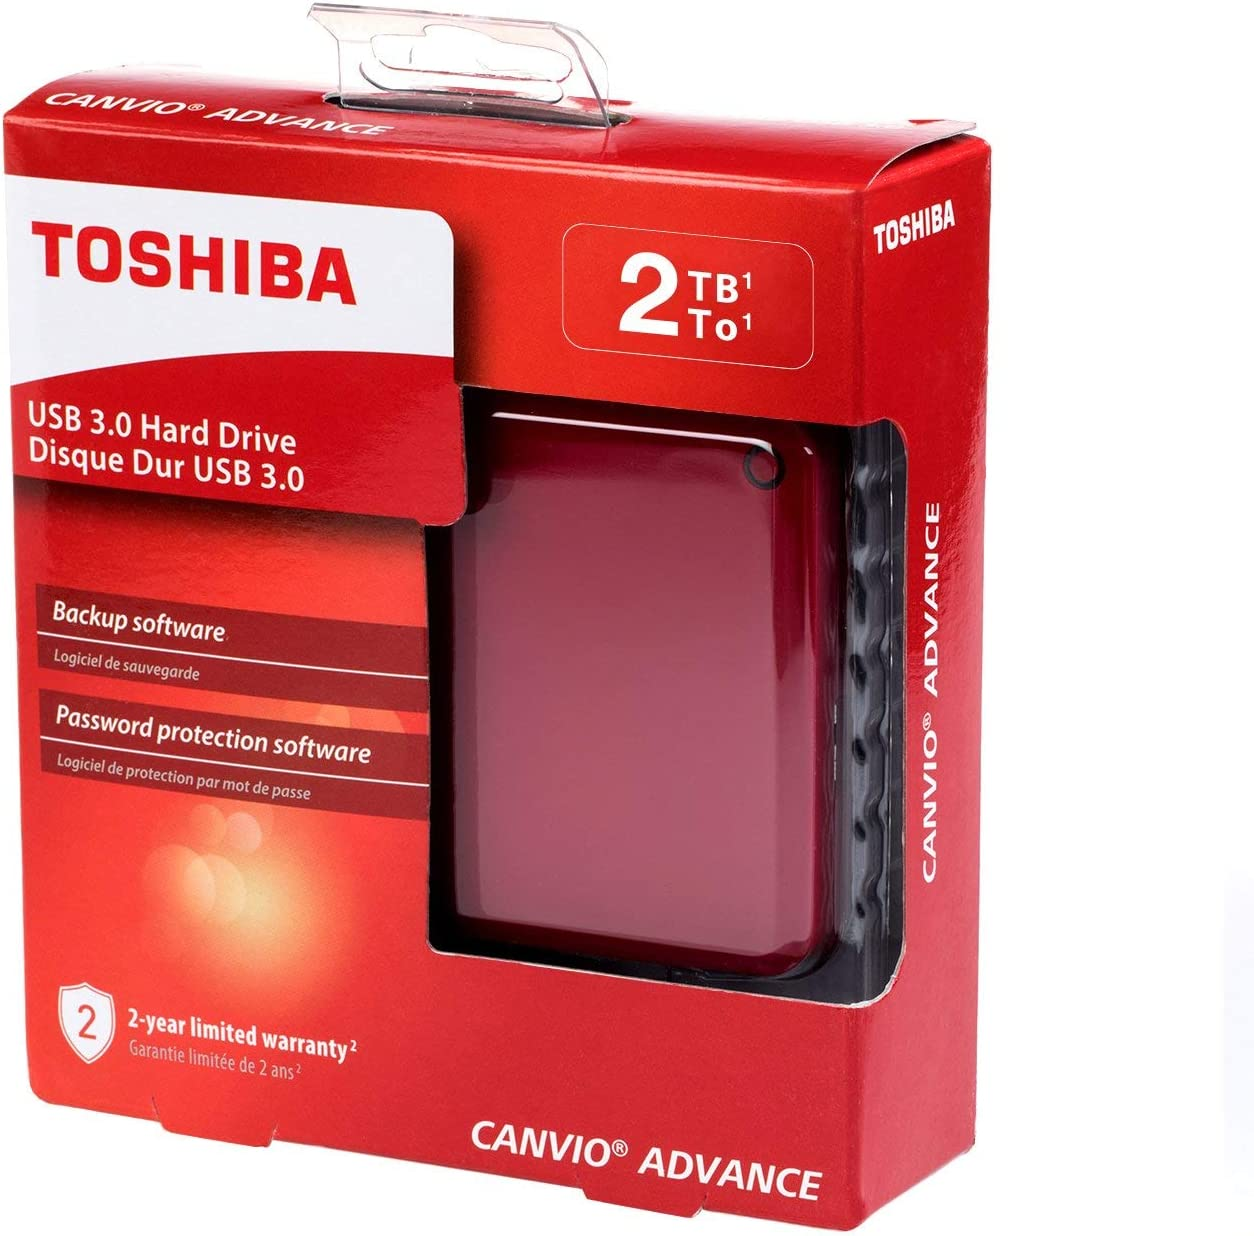 White Canvio Advance 4TB Portable External Hard Drive USB 3.0 Toshiba HDTC940XW3CA